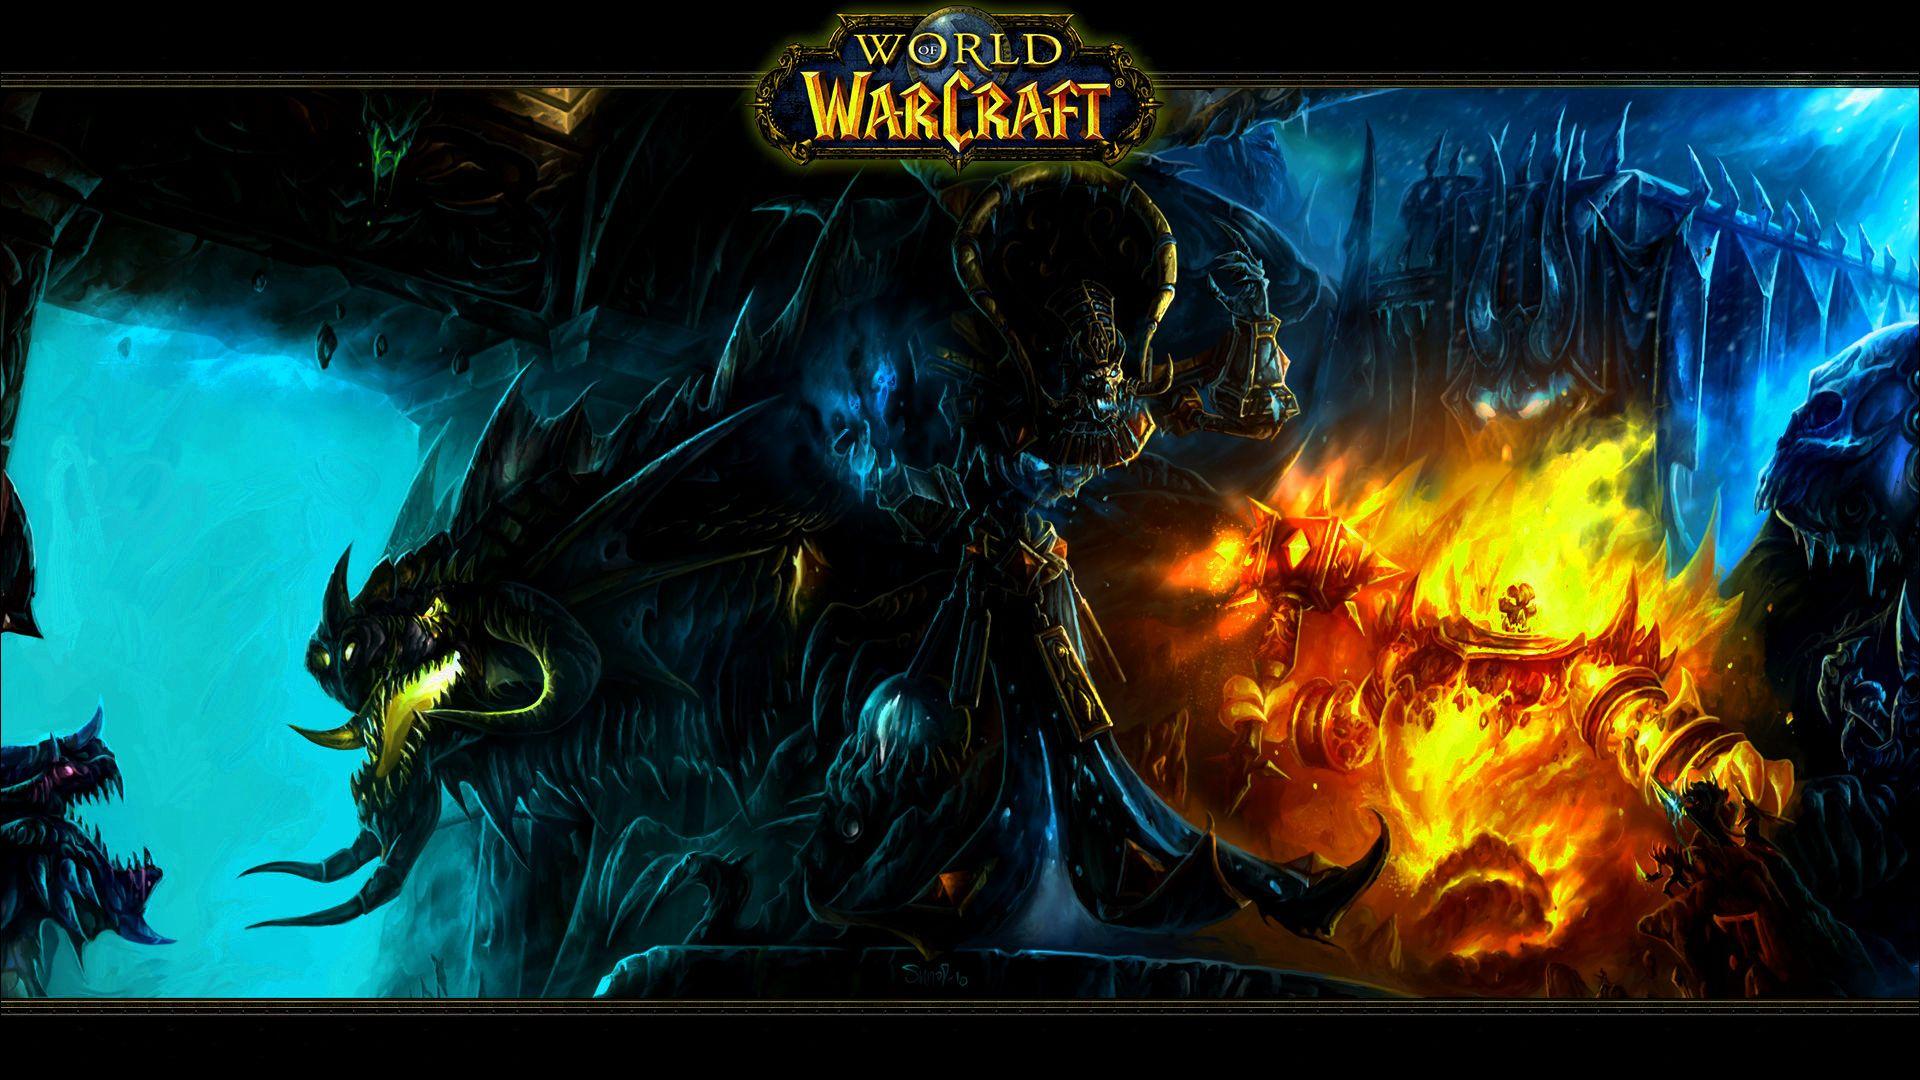 World Of Warcraft Wallpaper 1920 1080 Wallfree 100 Free High Definition Wallpaper High D World Of Warcraft Wallpaper World Of Warcraft Expansions Warcraft